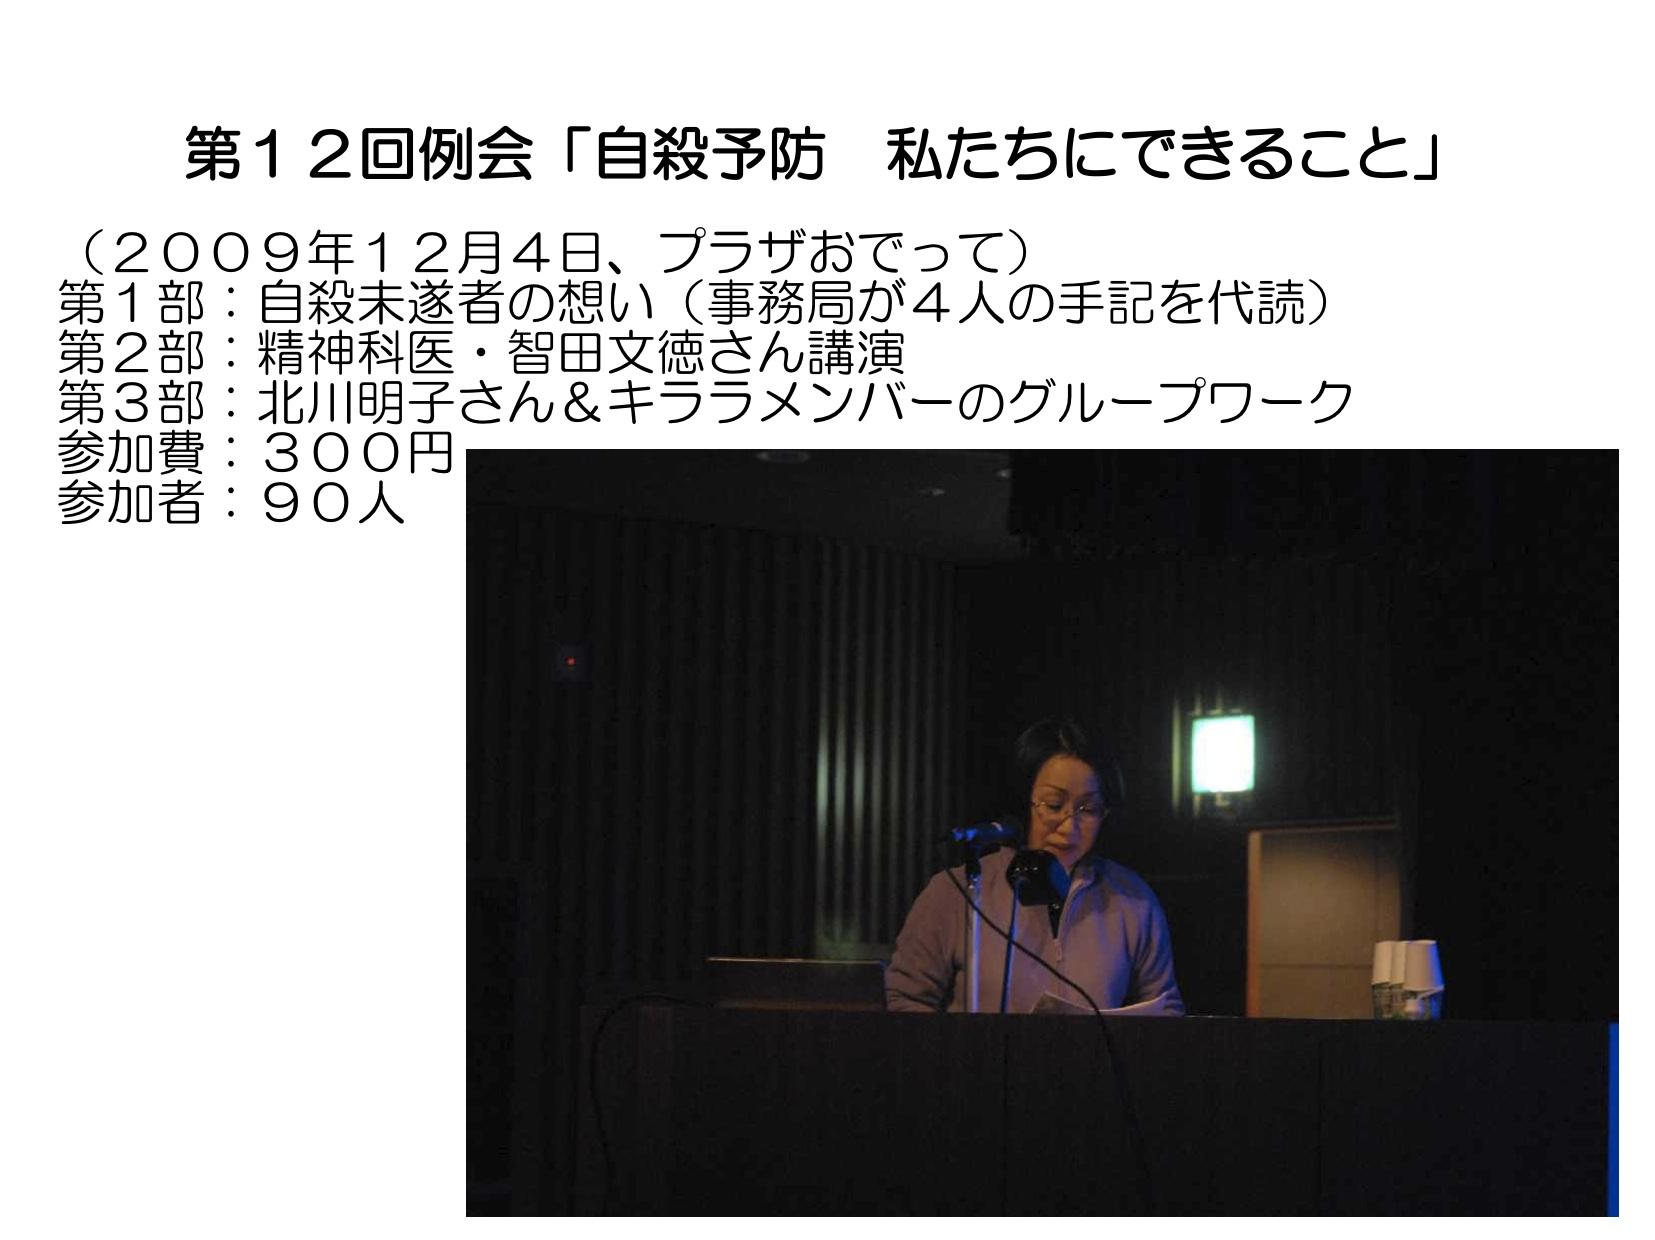 PS養成講座…パワーポイント資料③_a0103650_20461525.jpg